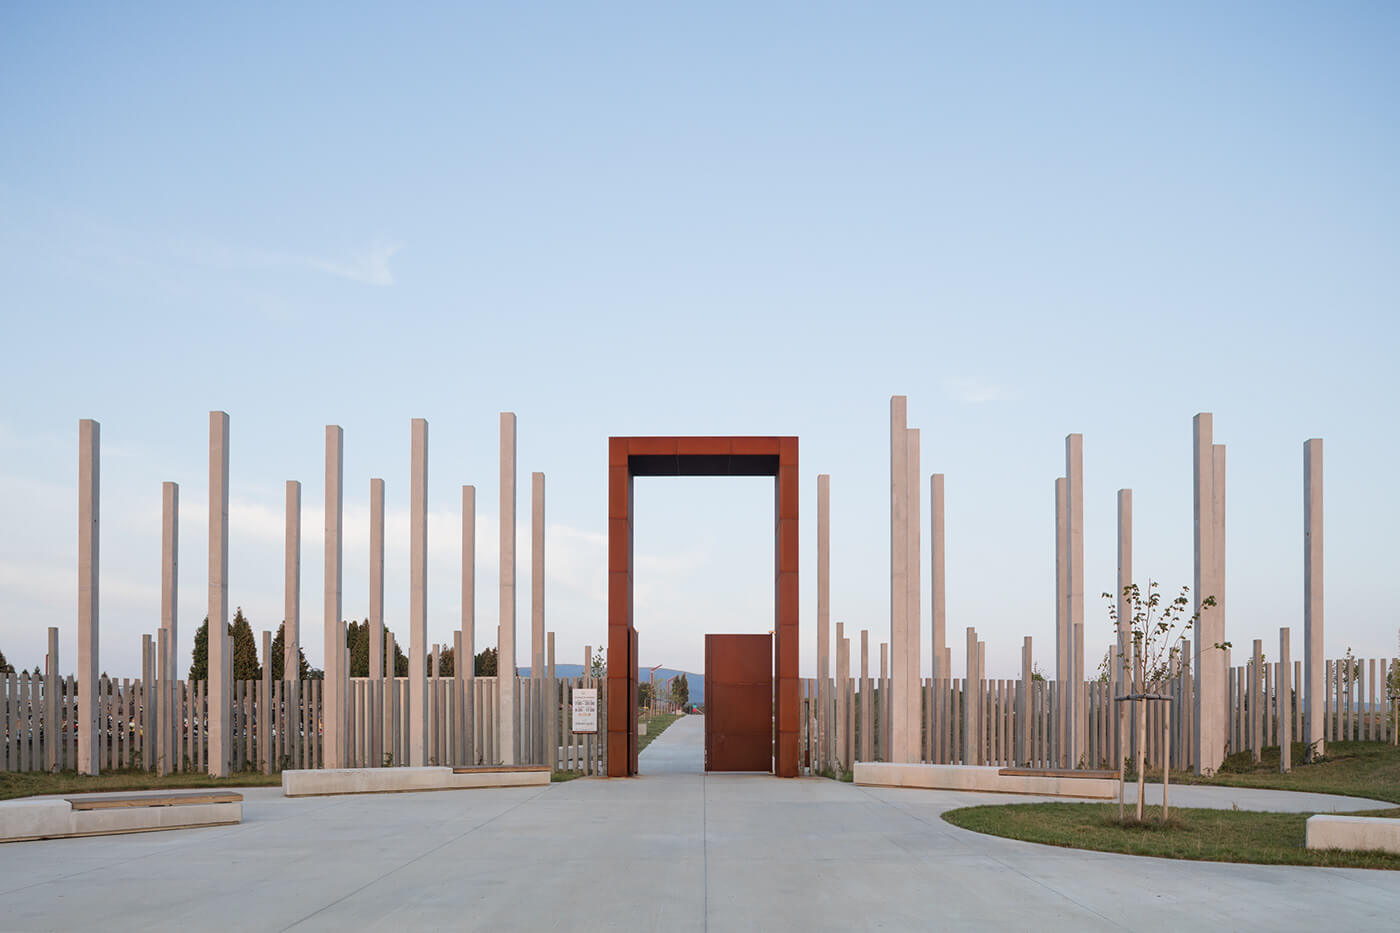 пр цвинтар 22